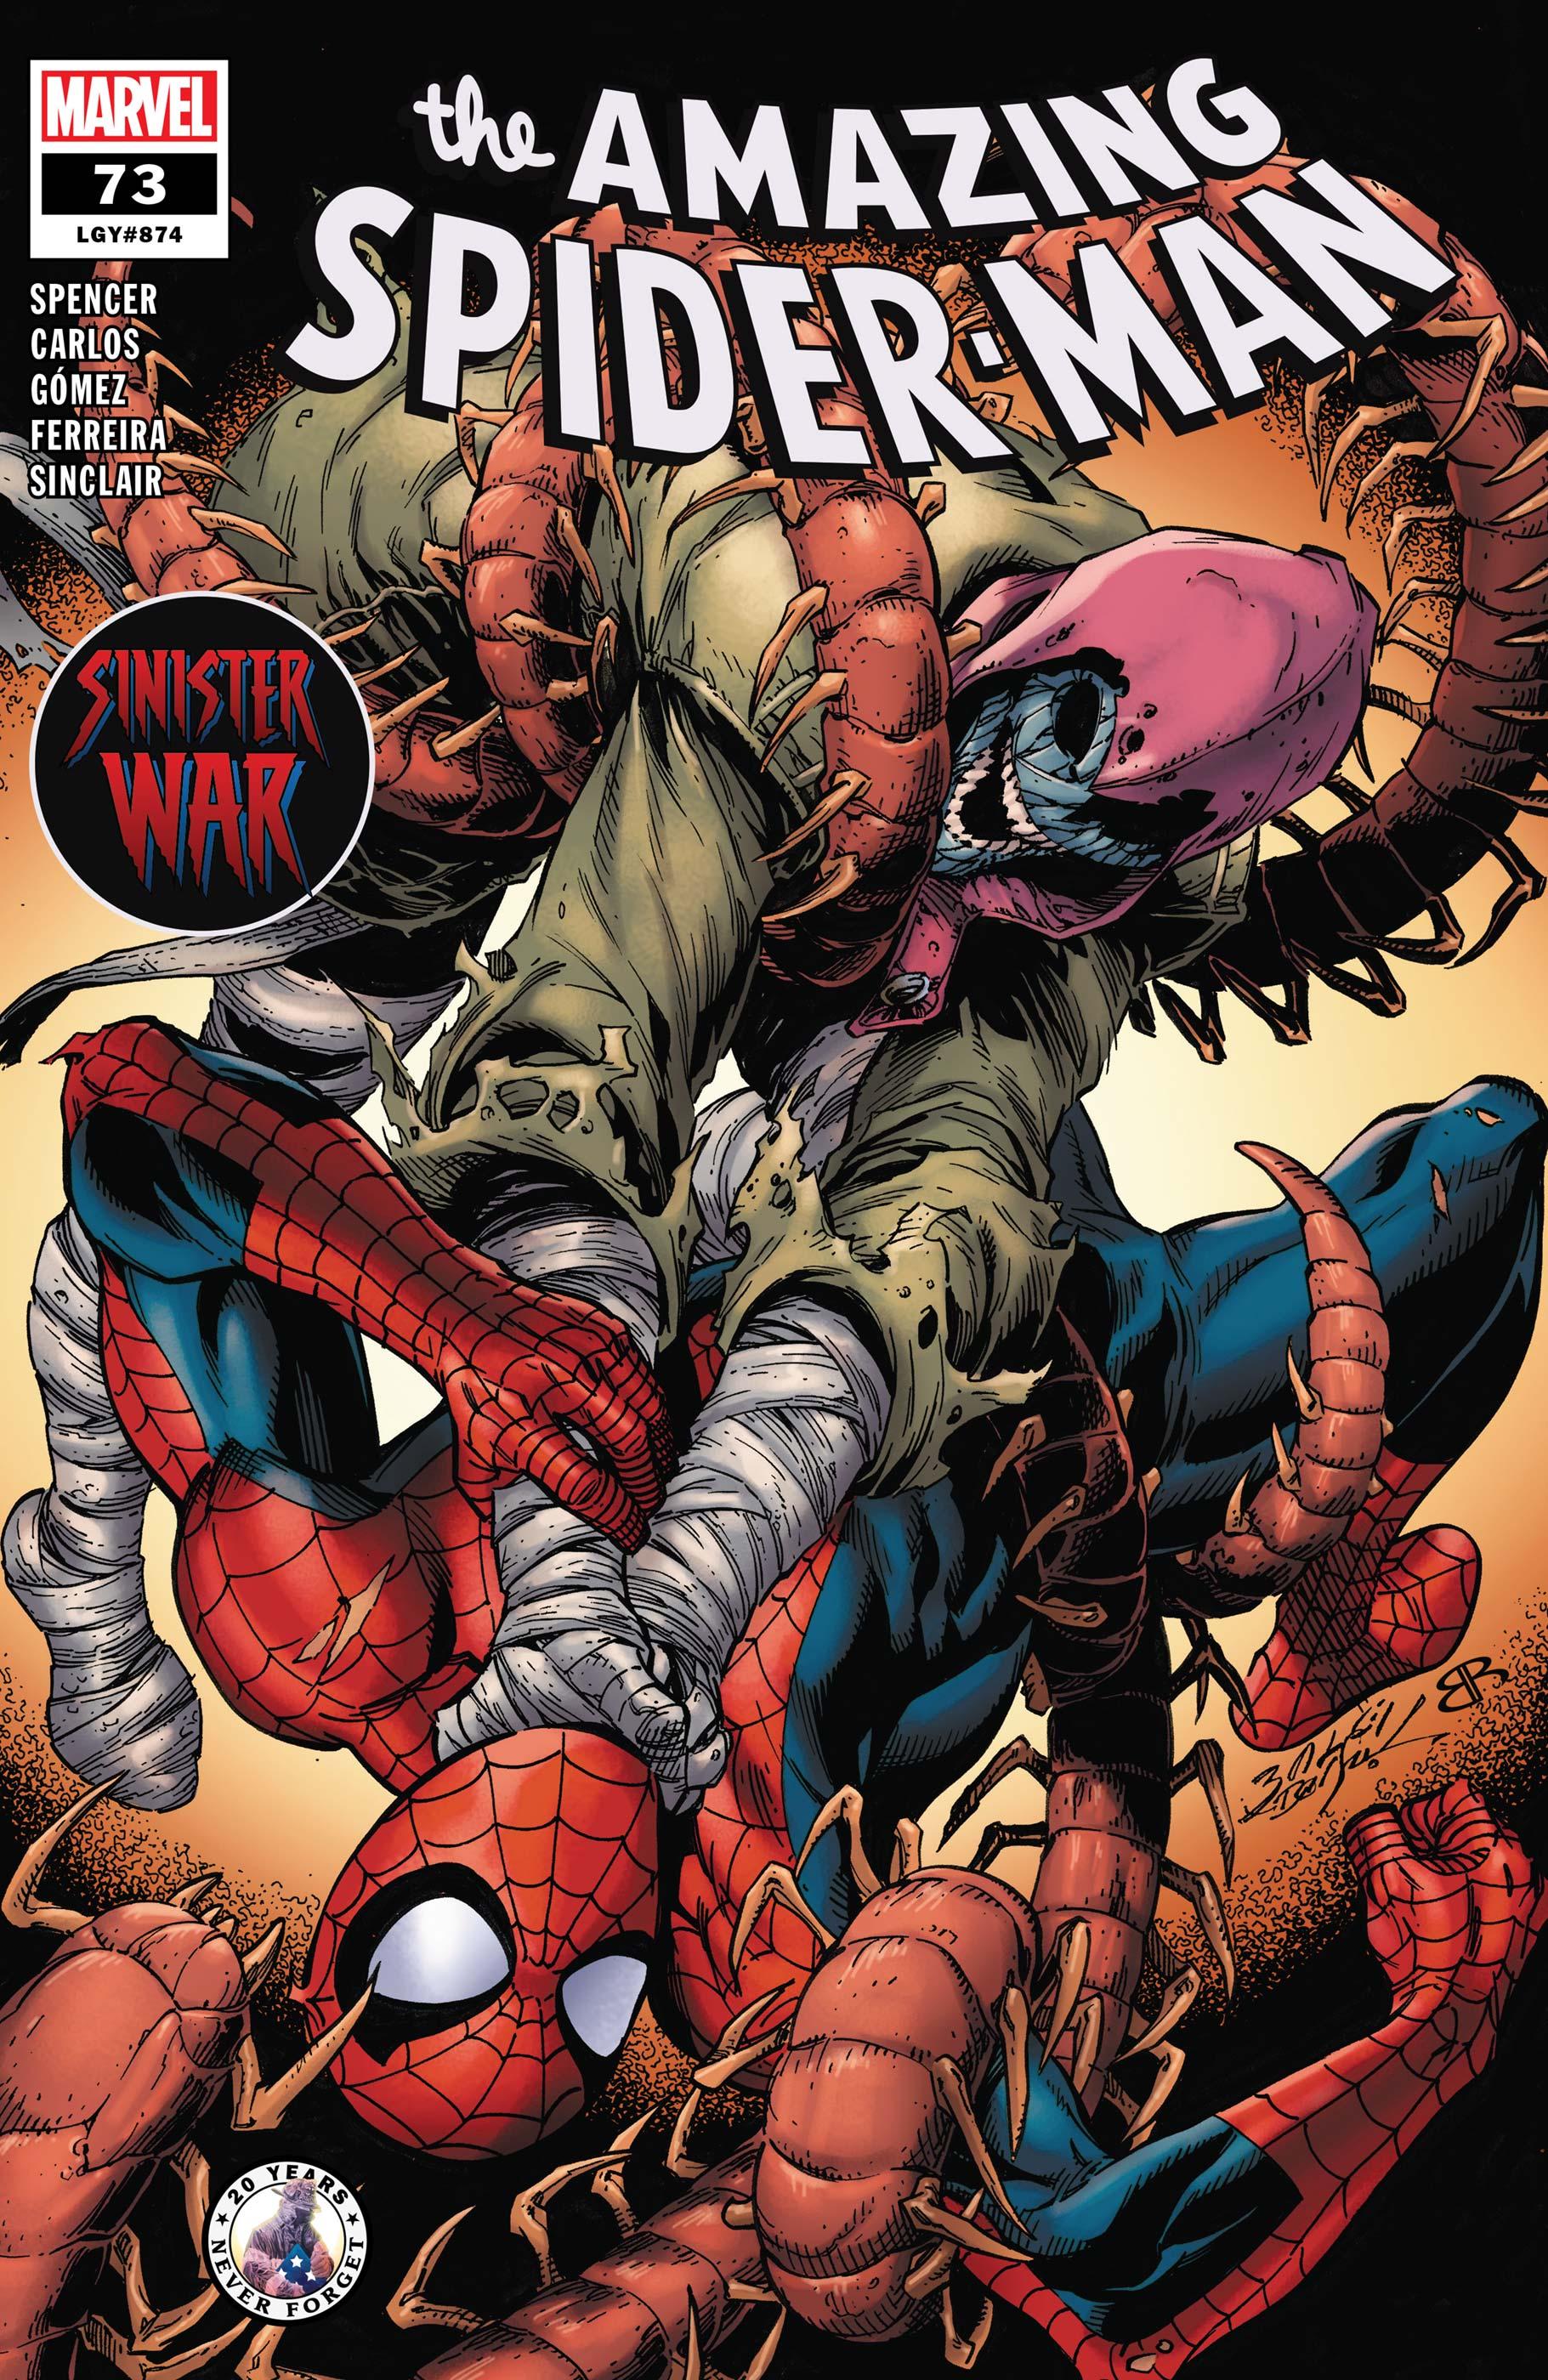 The Amazing Spider-Man (2018) #73